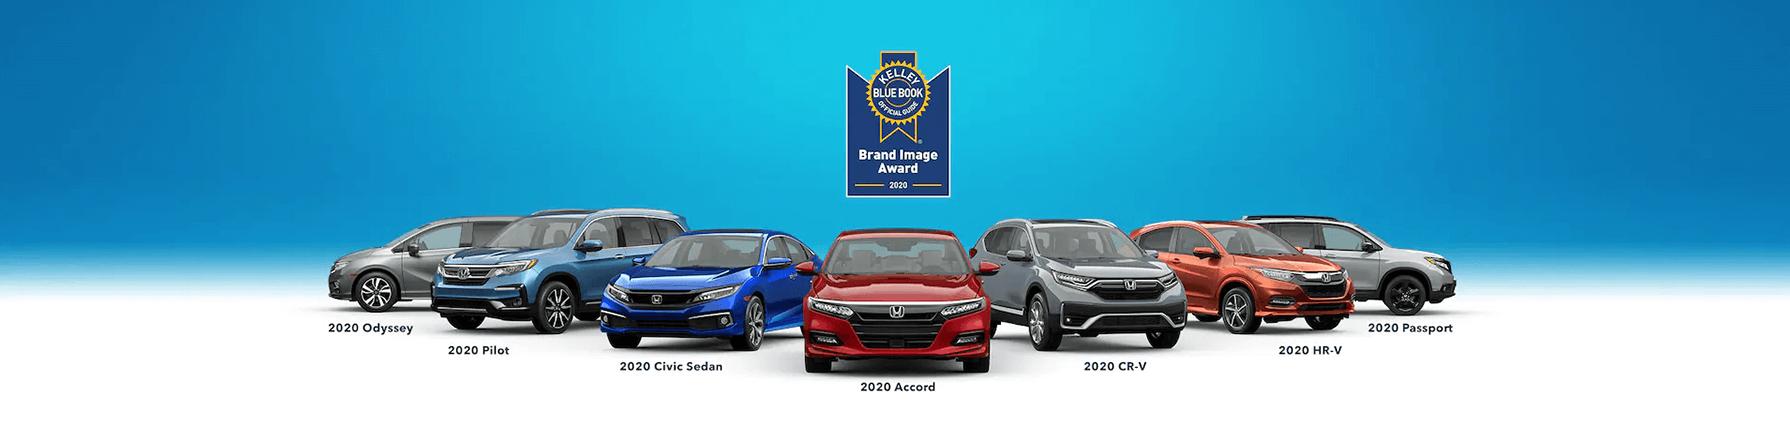 Honda Kelley Blue Book Best Value Brand Banner